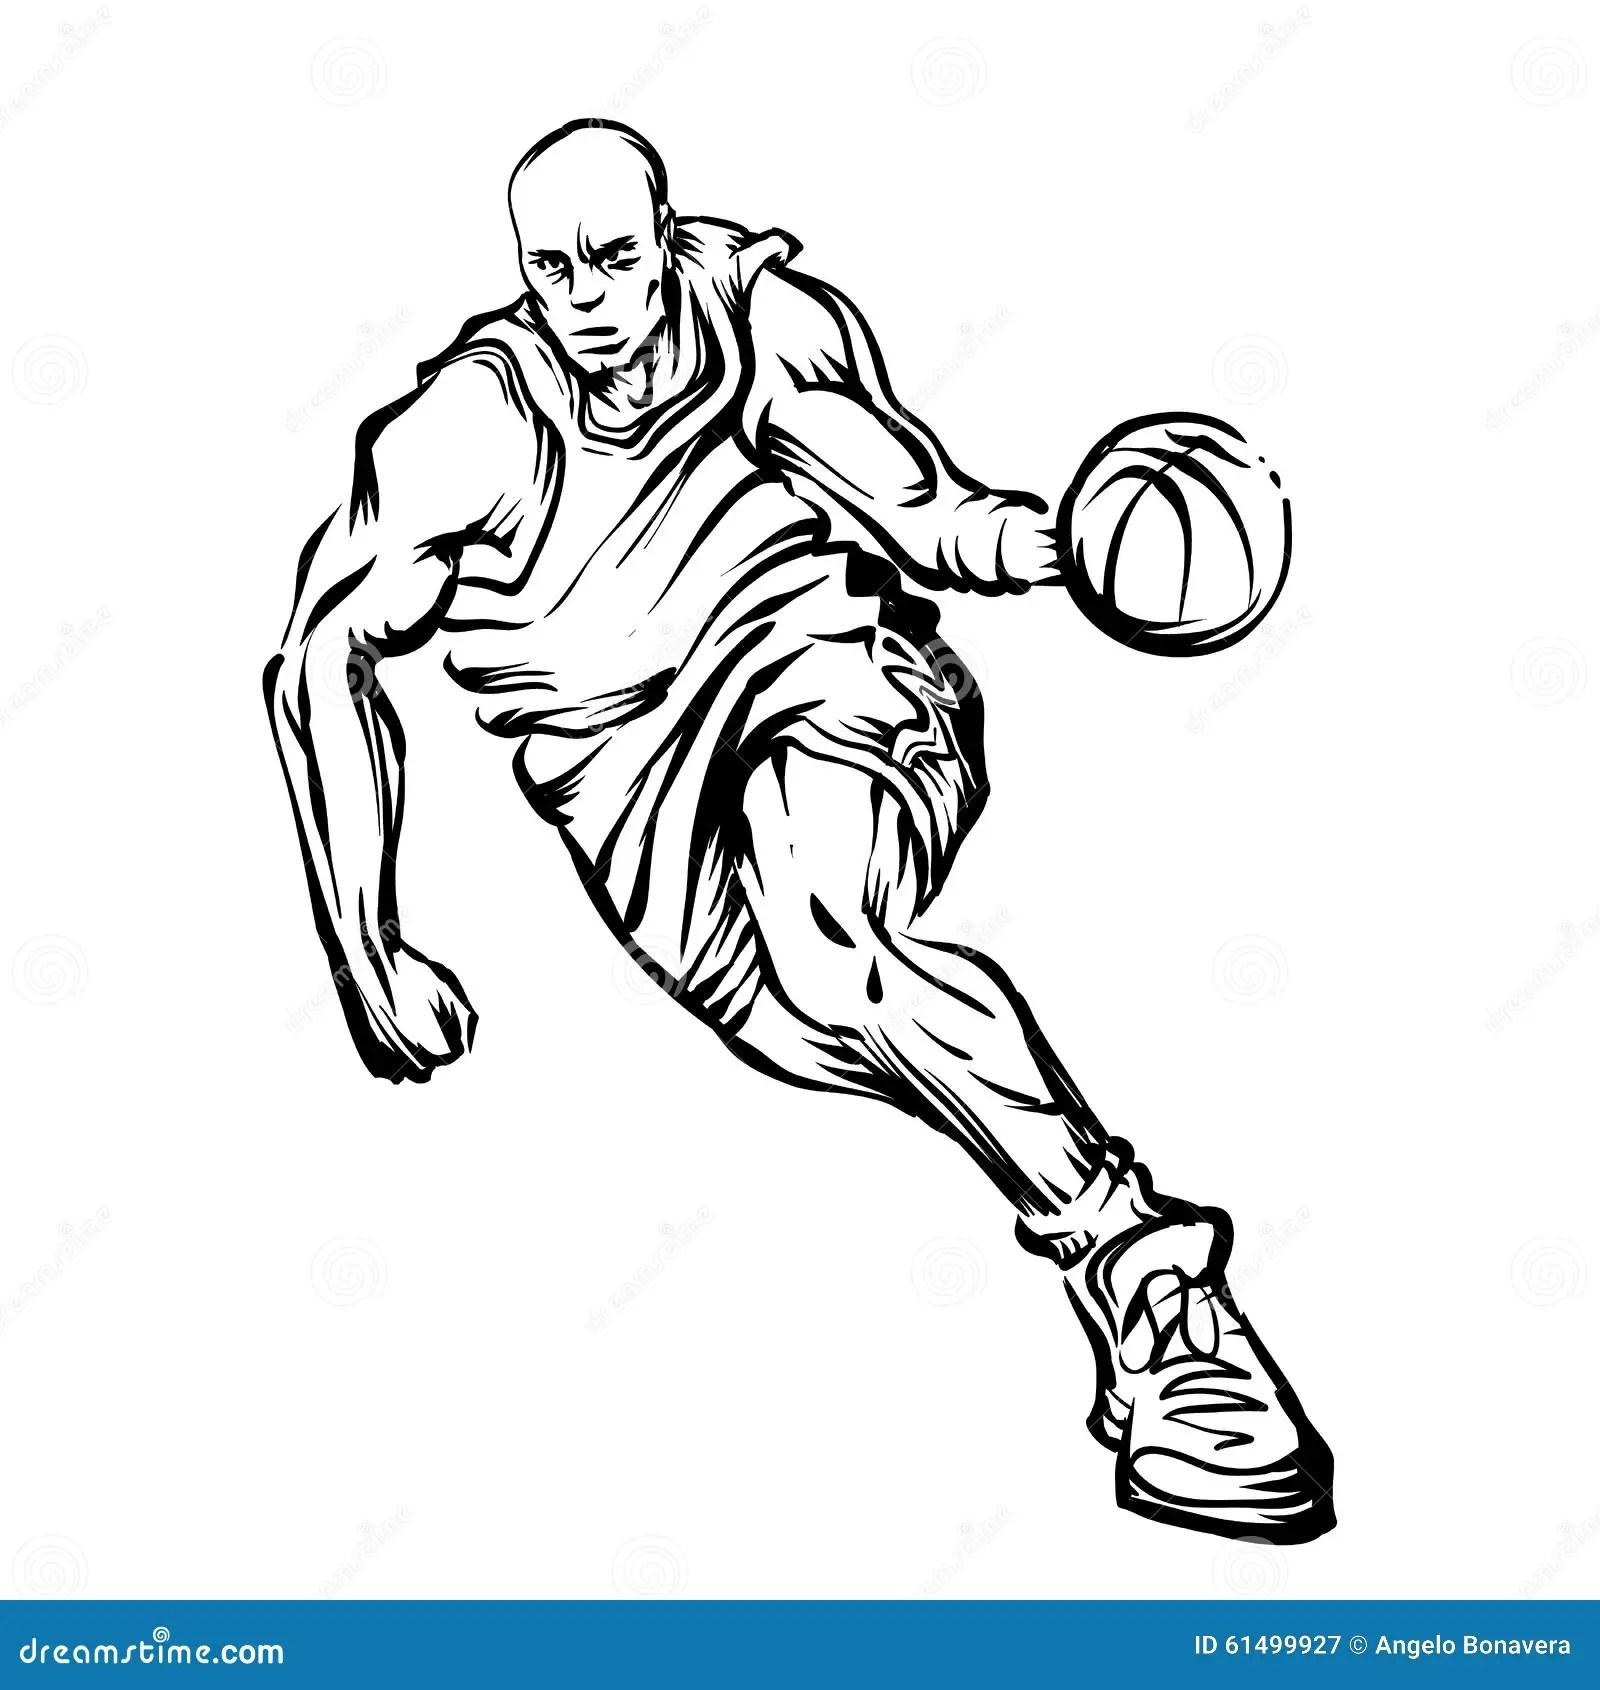 Basketball Player Stock Illustration